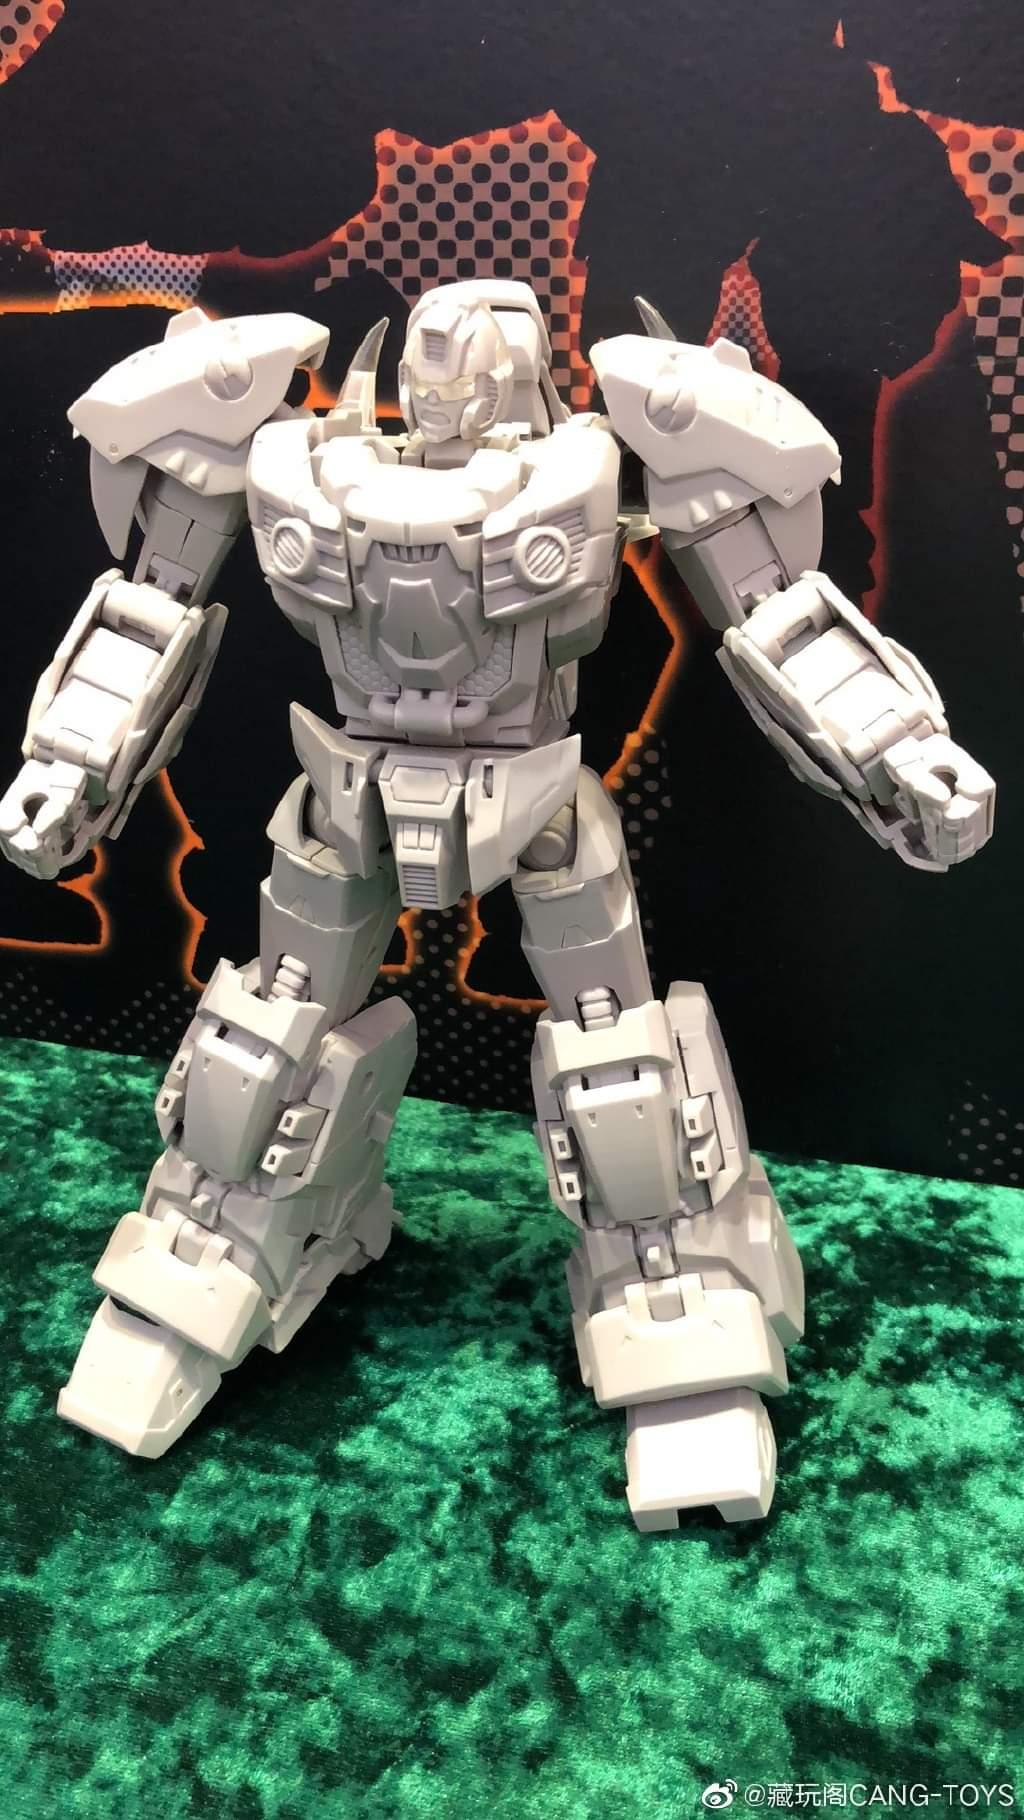 [Toyworld][Cang-Toys] Produit Tiers - Thunderking/Chiyou - aka Predaking/Prédaroi (Prédacons) 62OozJ6y_o